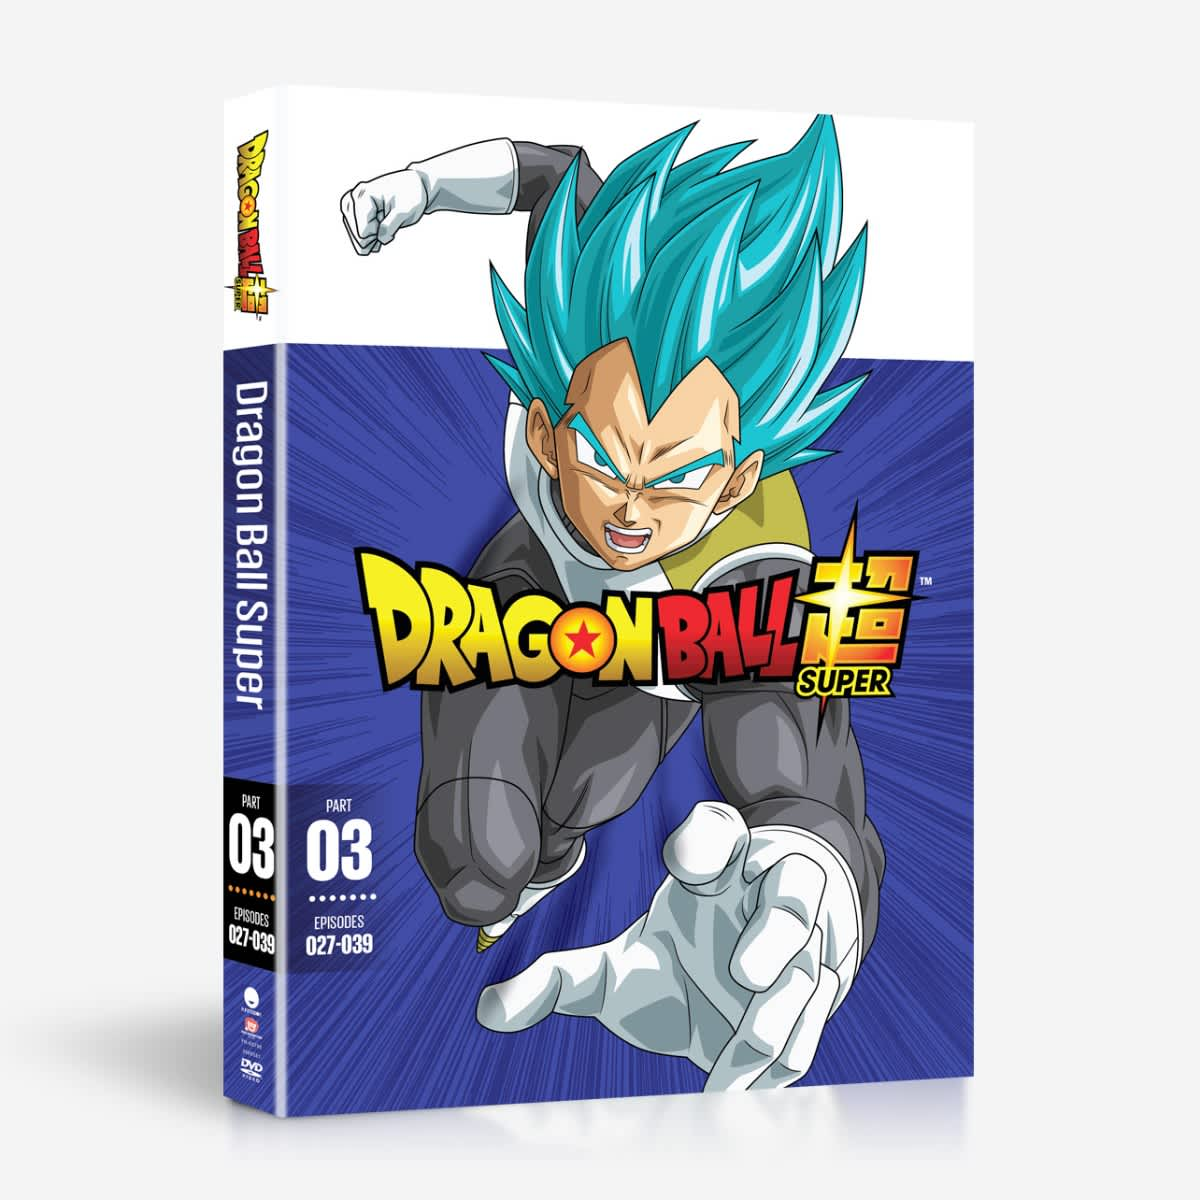 Dragon Ball Super Part 3 DVD